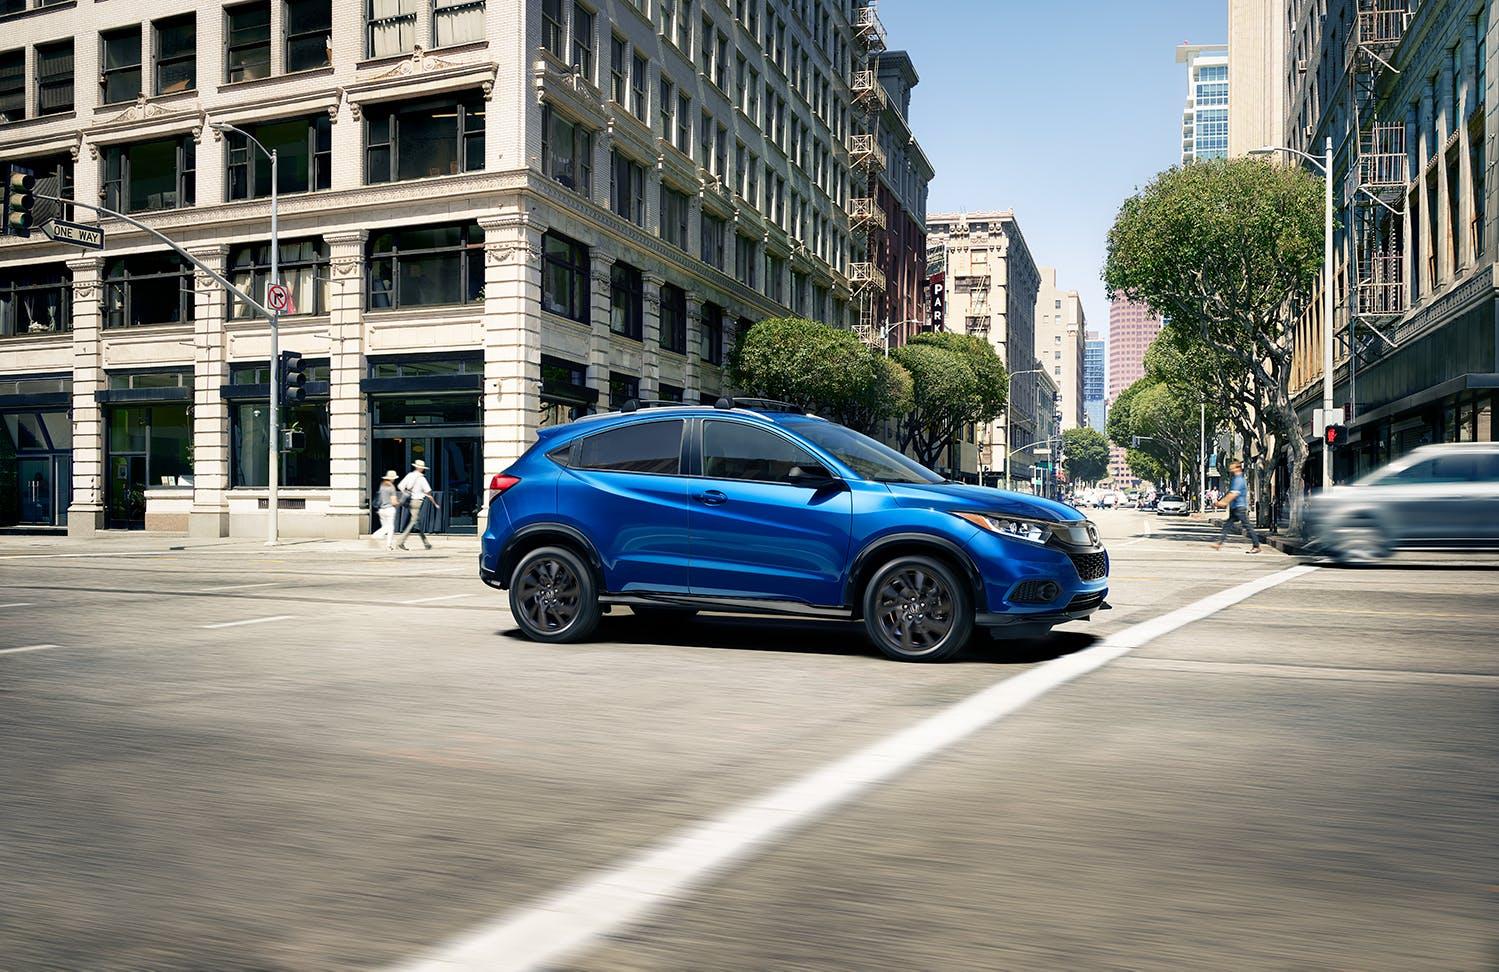 Washington Honda is a Honda Dealership in Washington near Waynesburg PA | 2021 Honda HR-V driving through the city